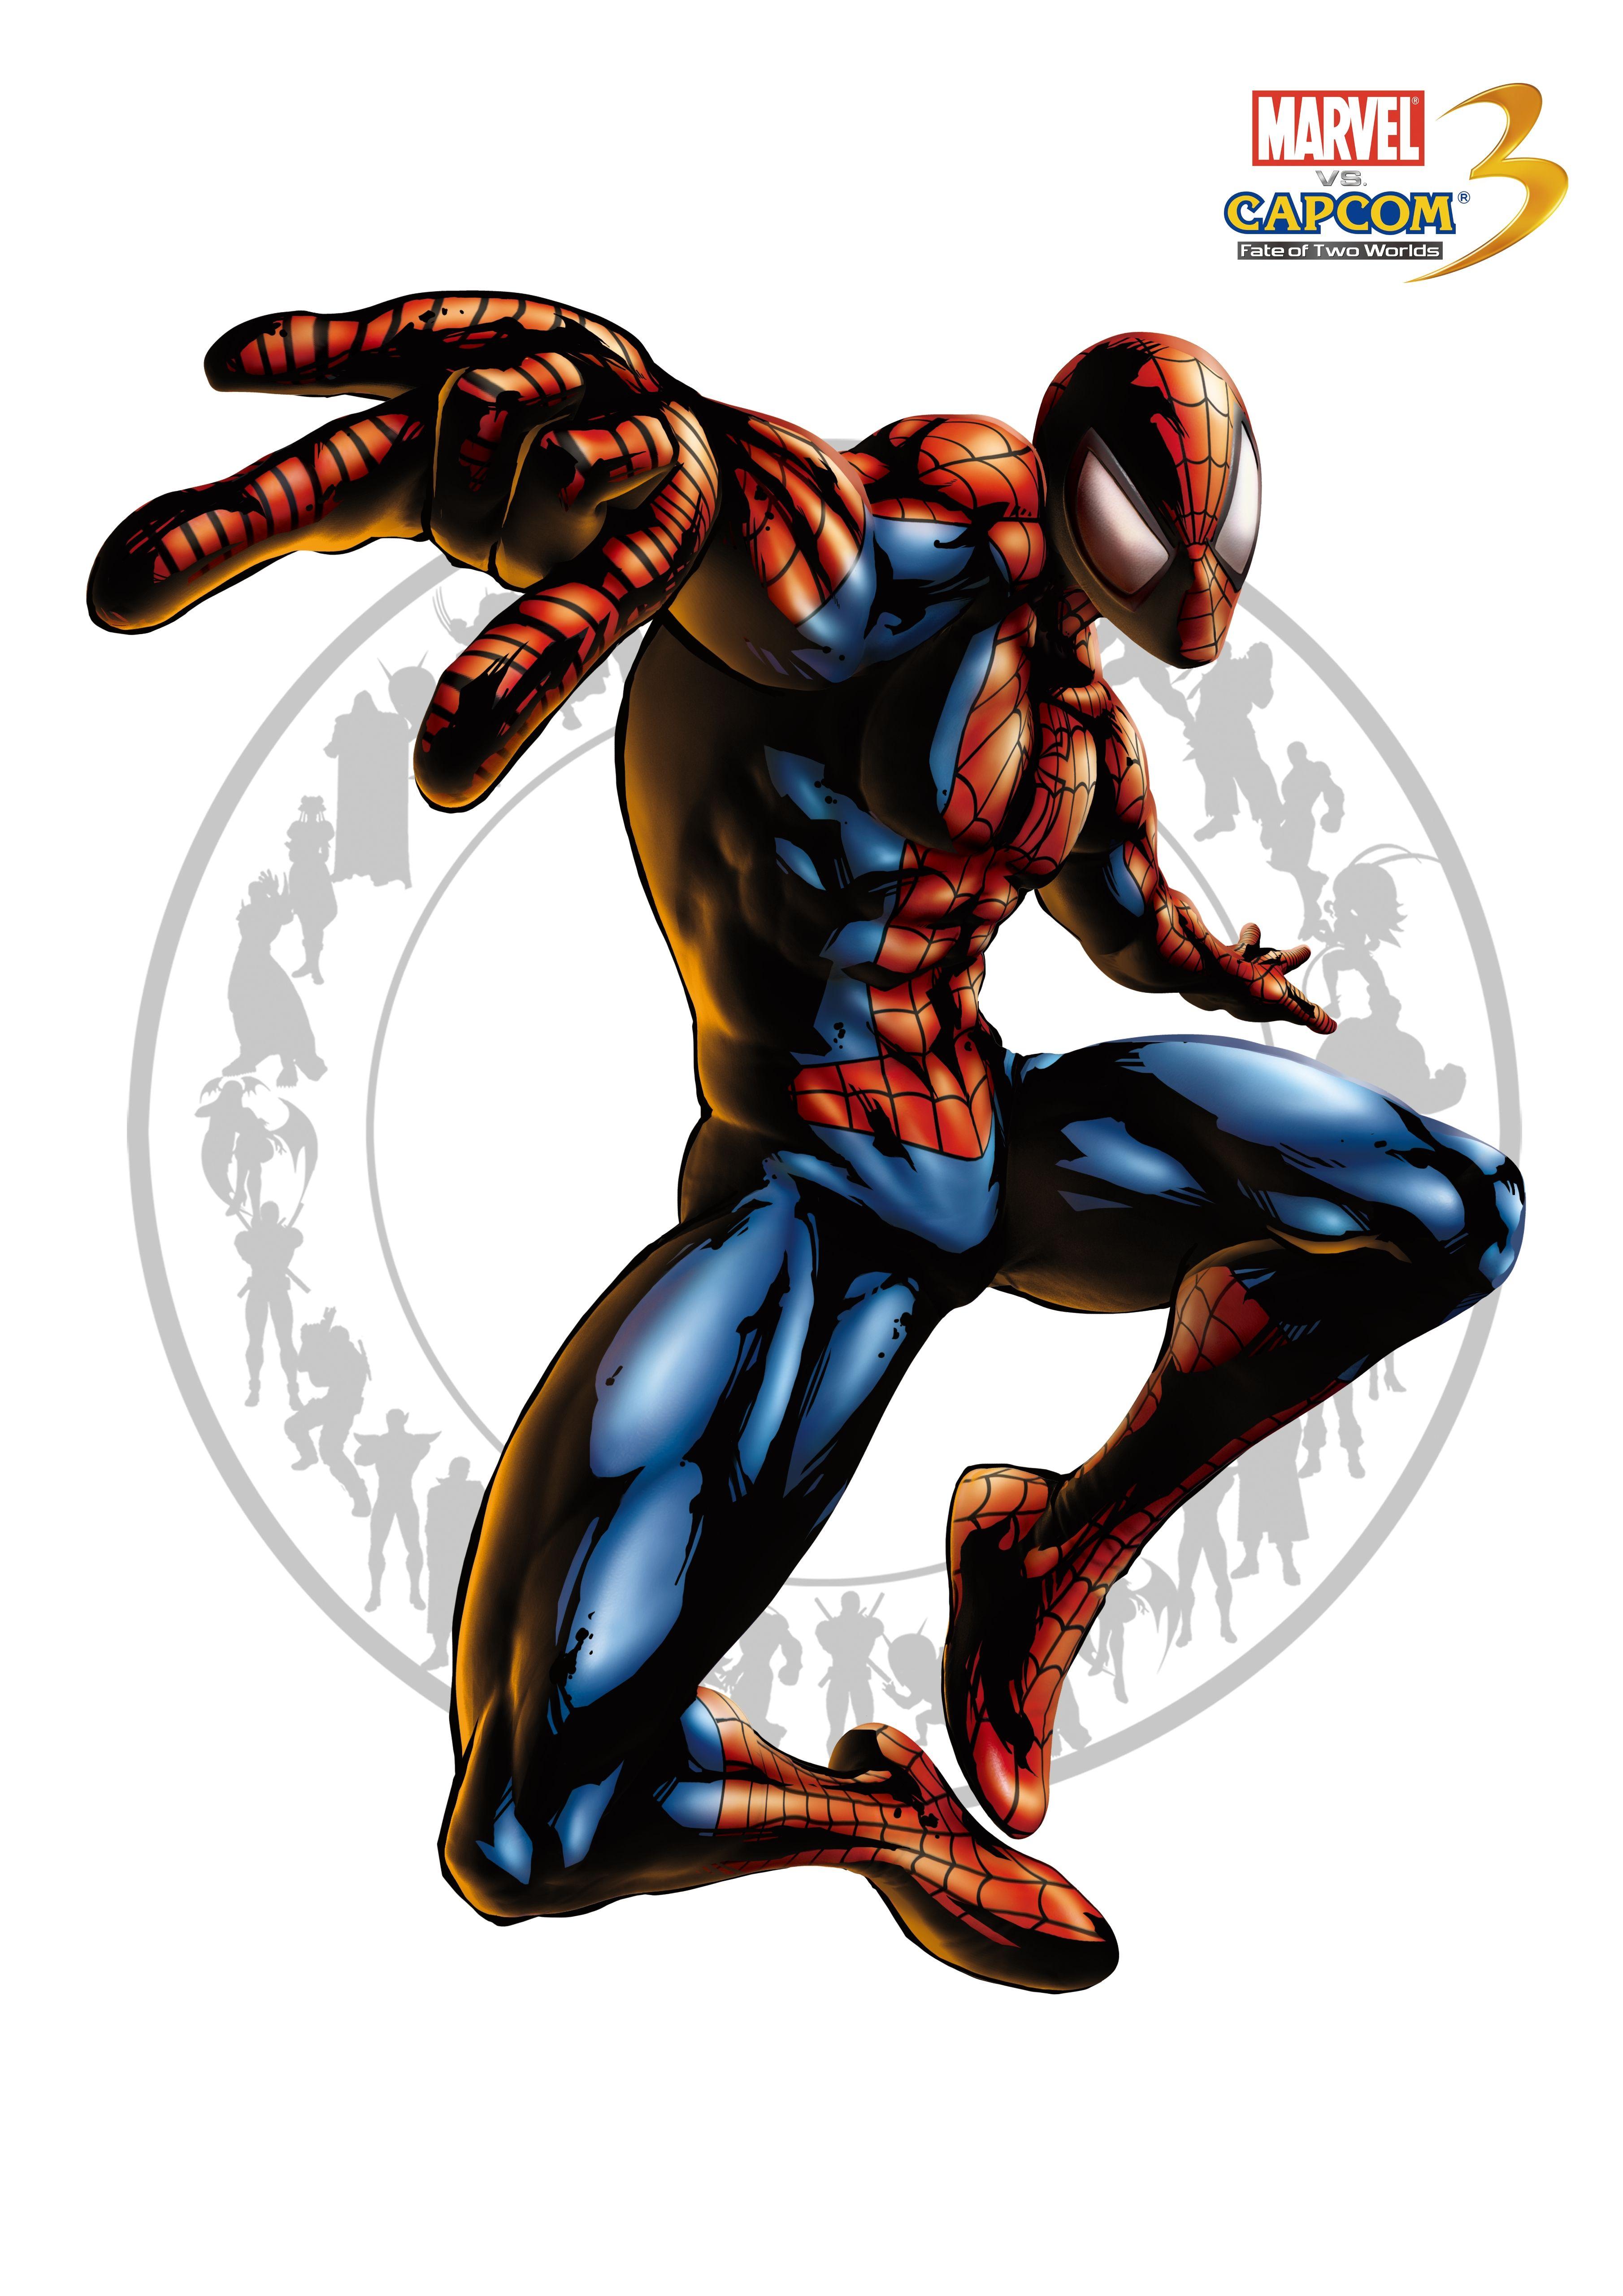 Человек-паук - Marvel vs. Capcom 3: Fate of Two Worlds Арт, Персонаж